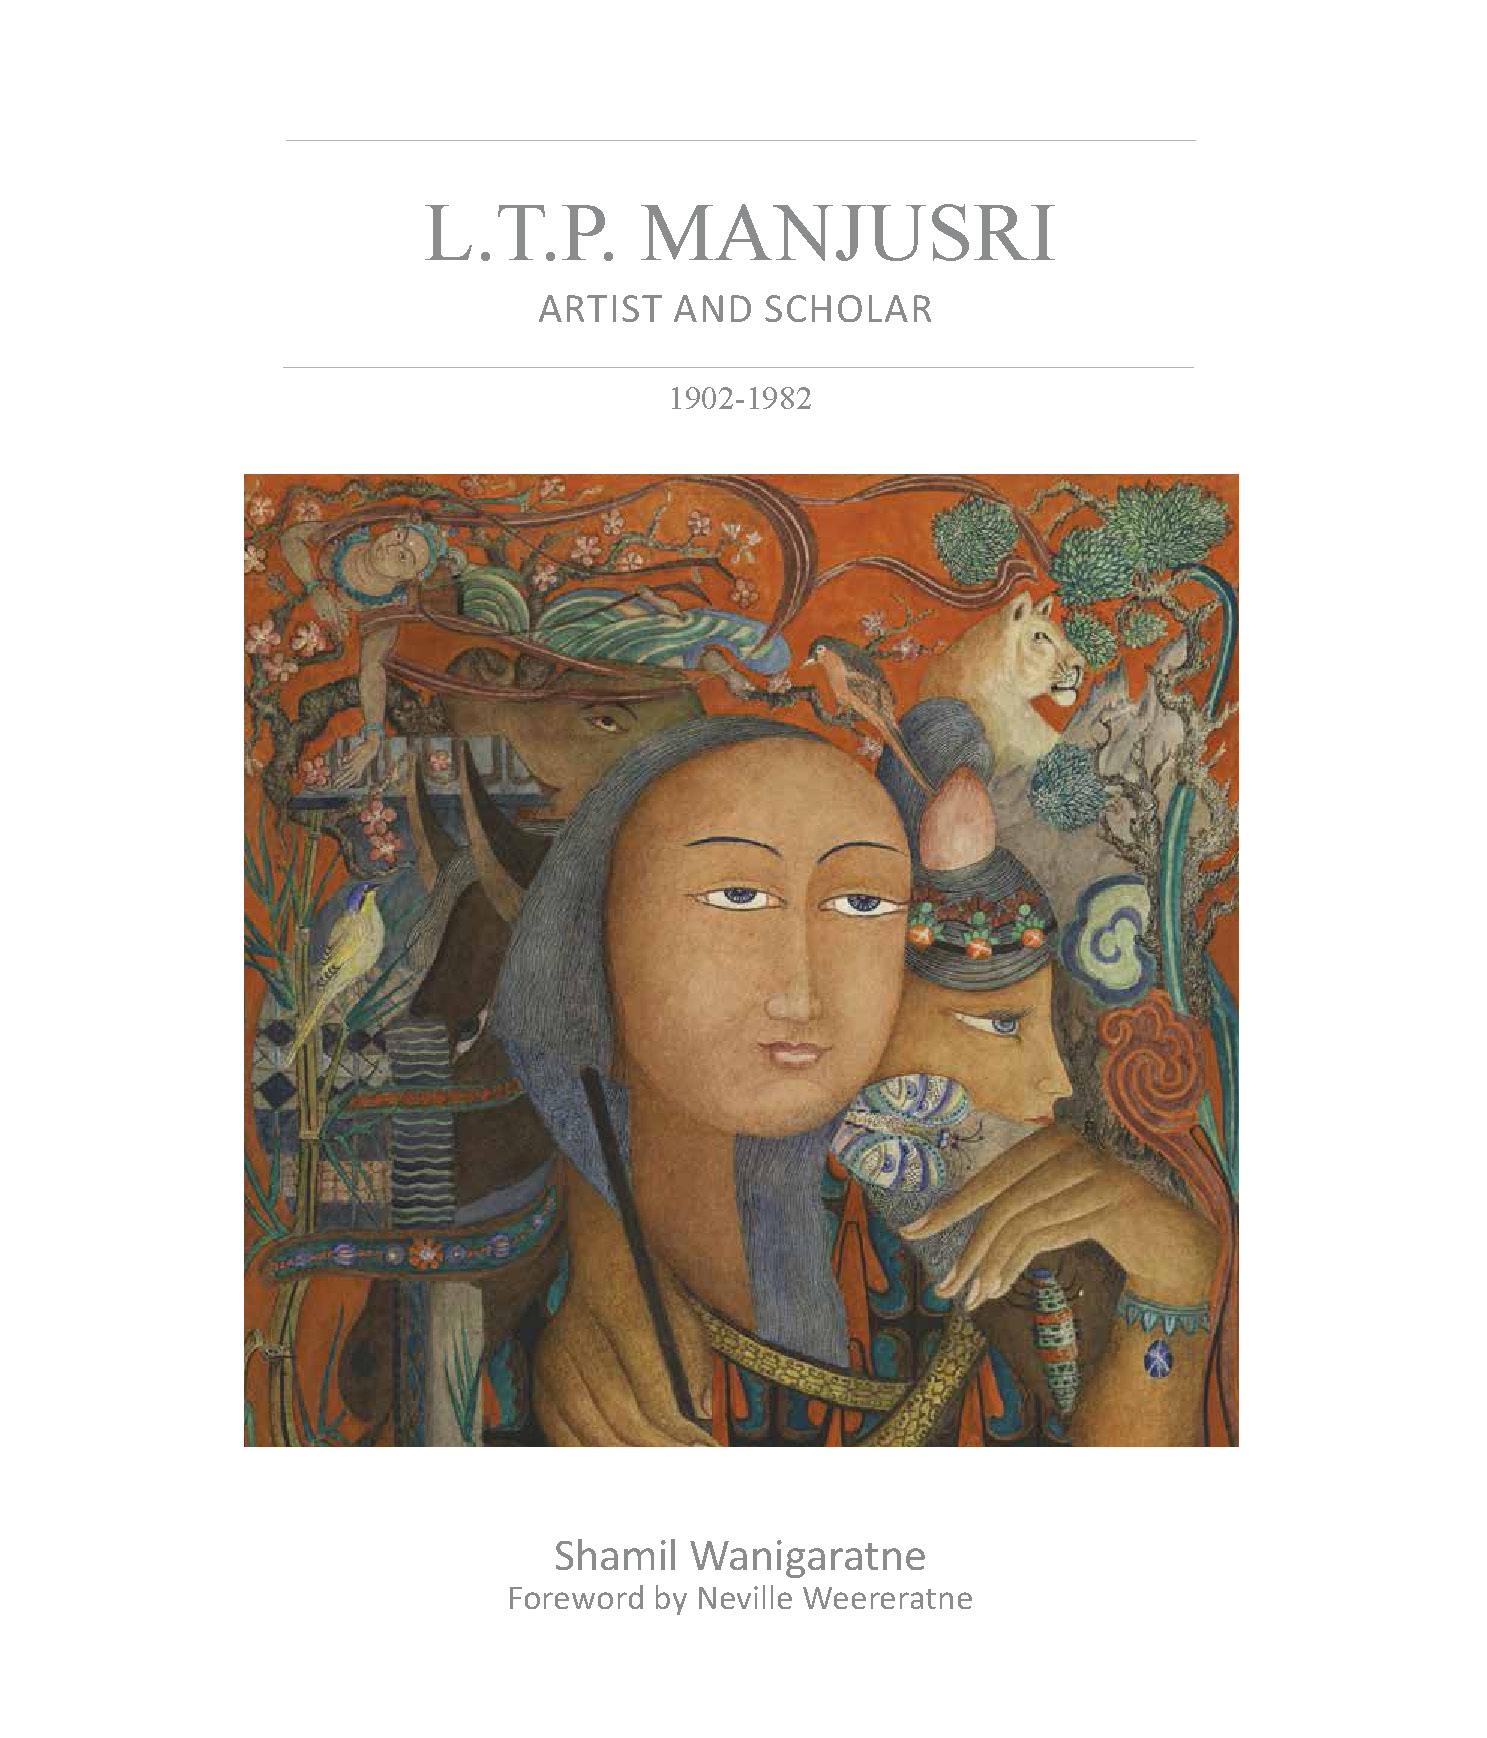 L.T.P. Manjusri: Artist and Scholar